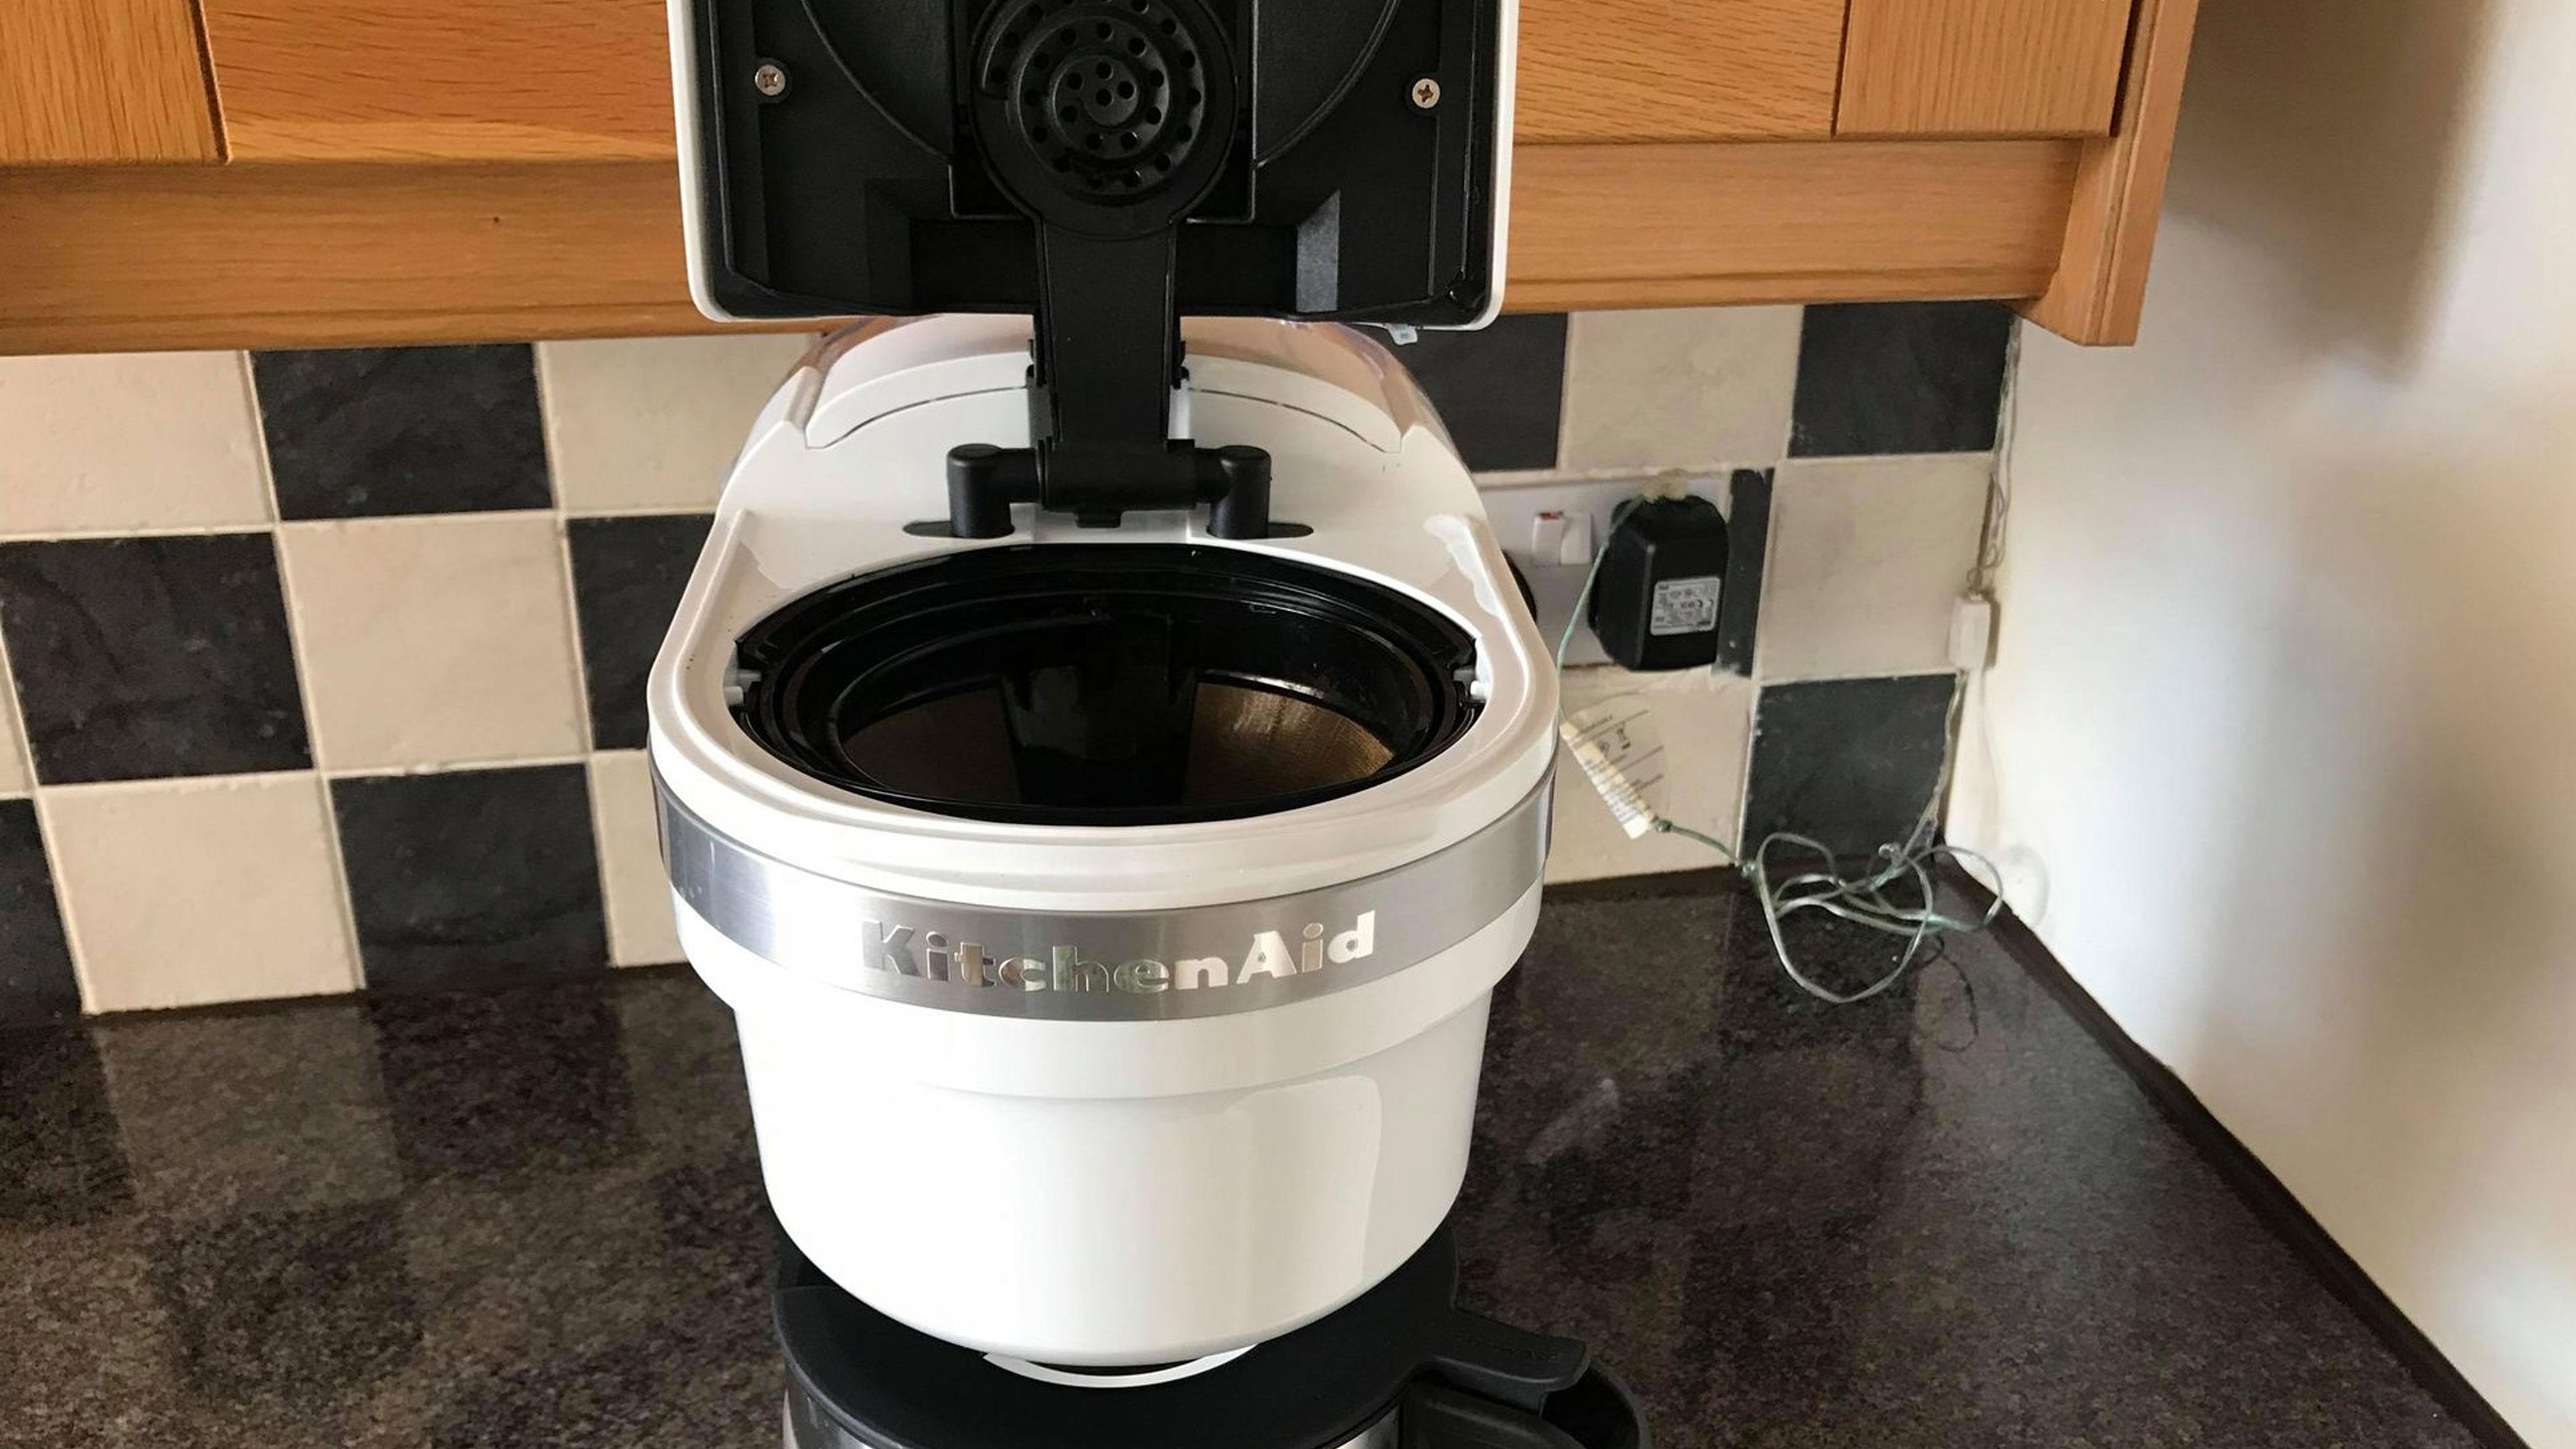 KitchenAid Classic 5KCM1208 Drip Coffee Maker